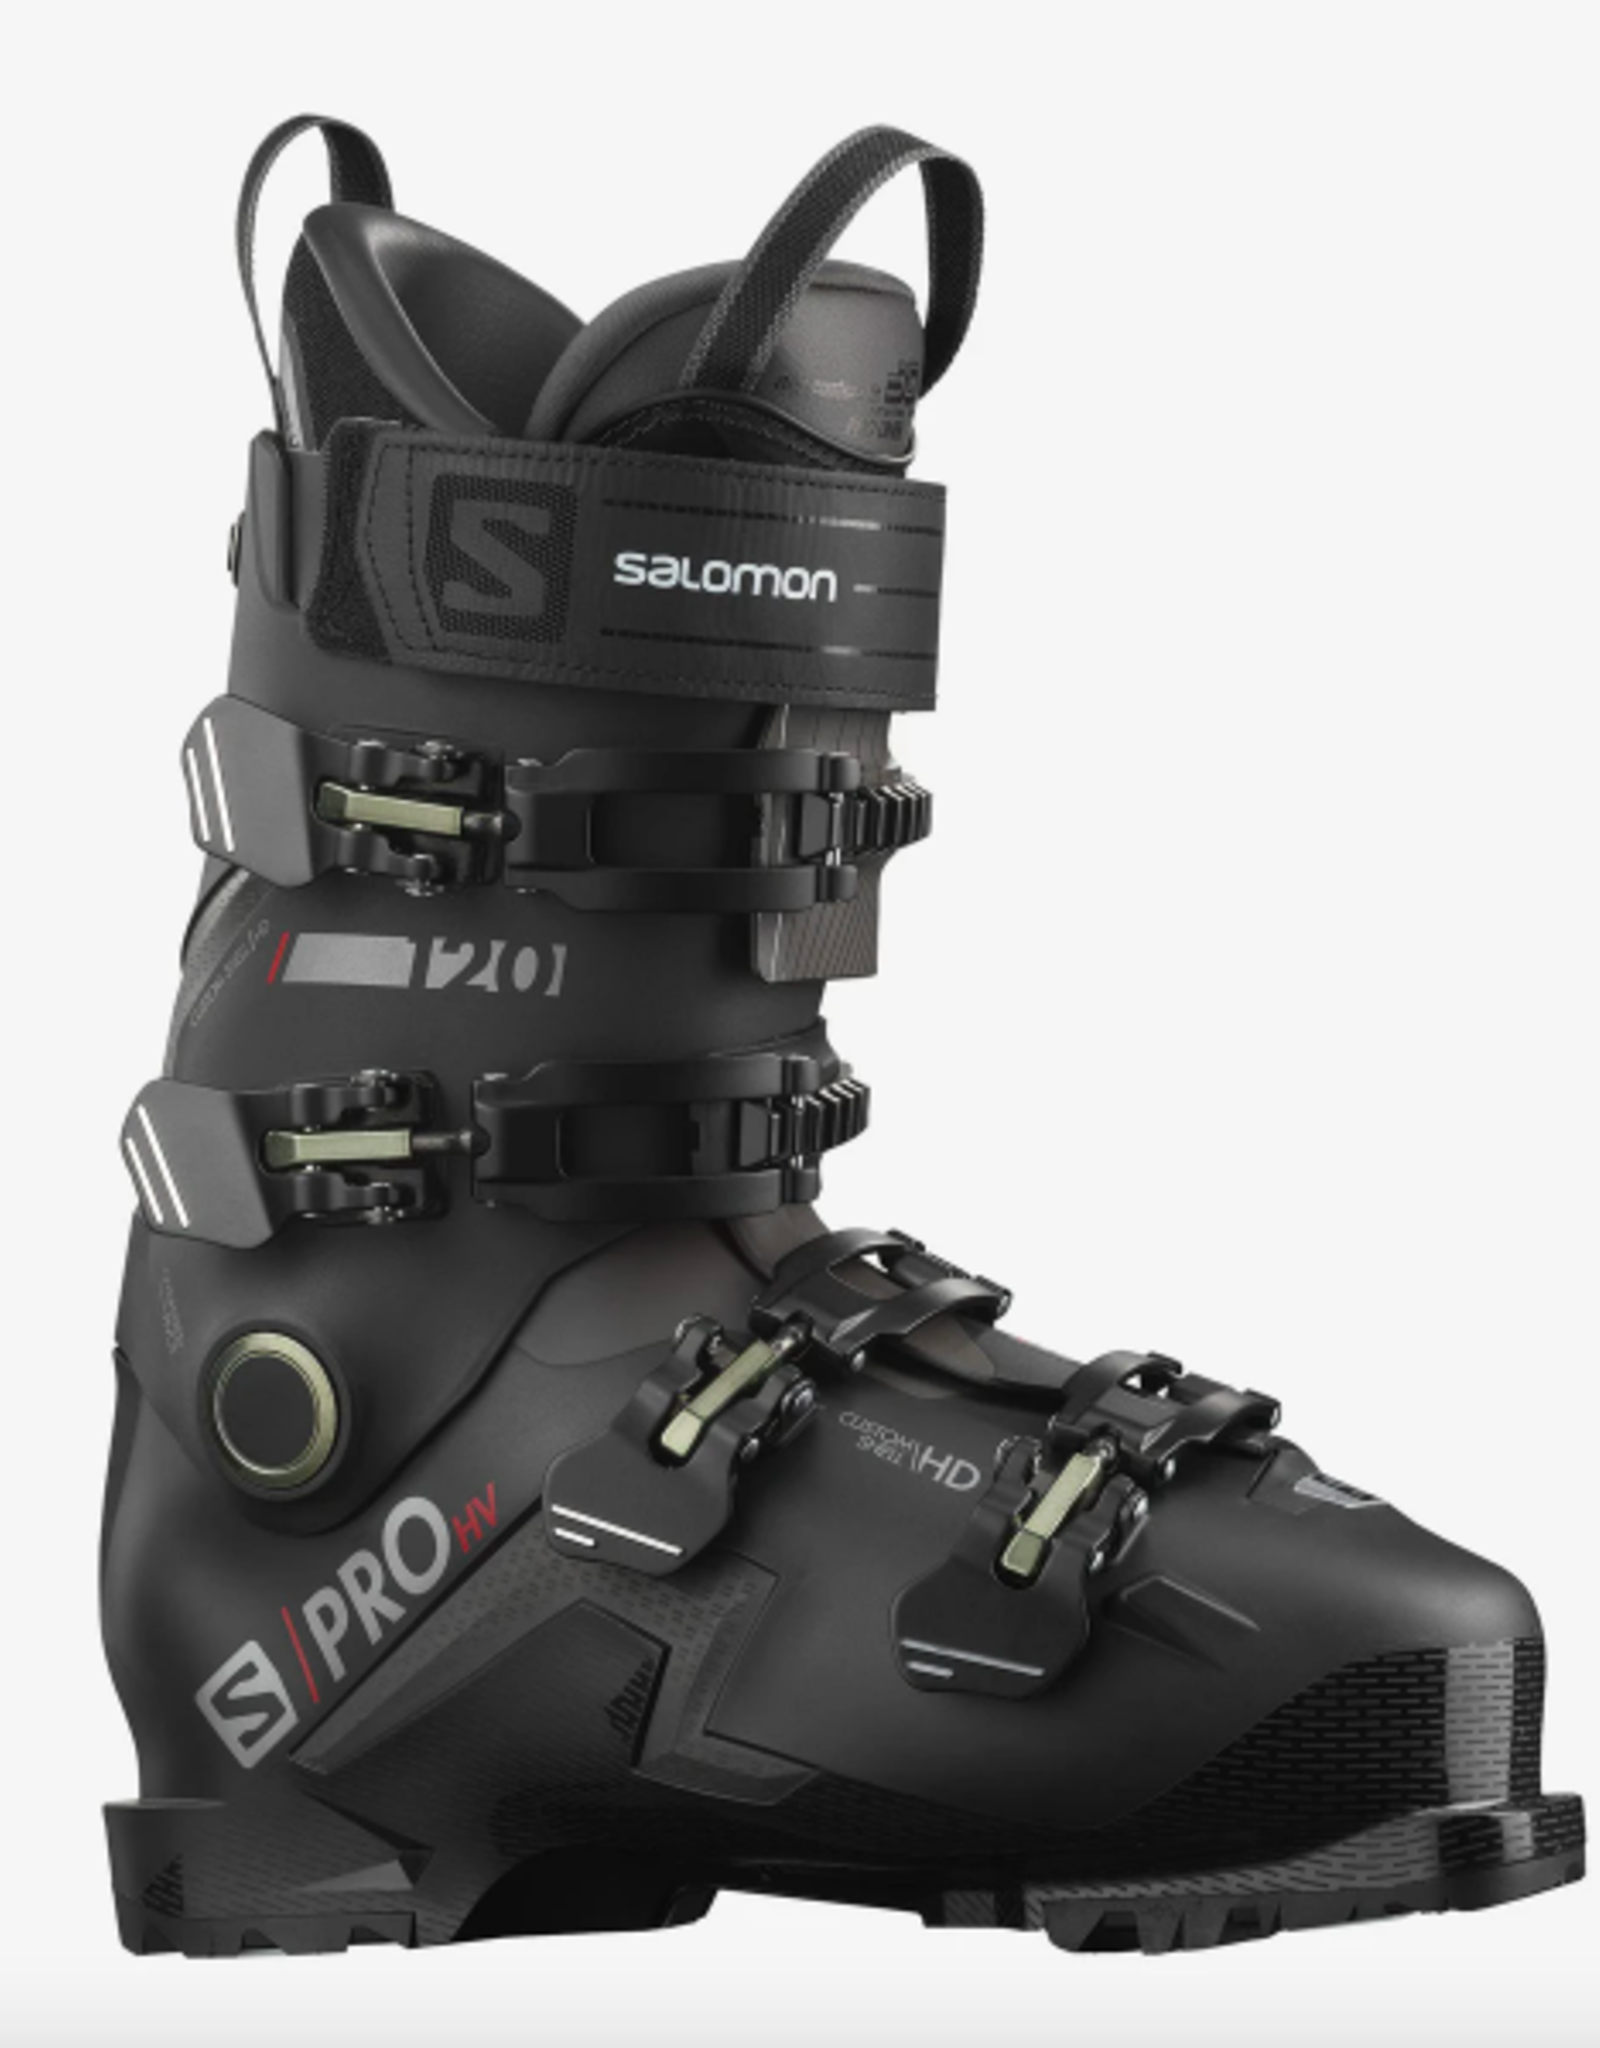 Salomon Men's S/Pro HV 120 GW Ski Boots Black/Red/Belluga 2022